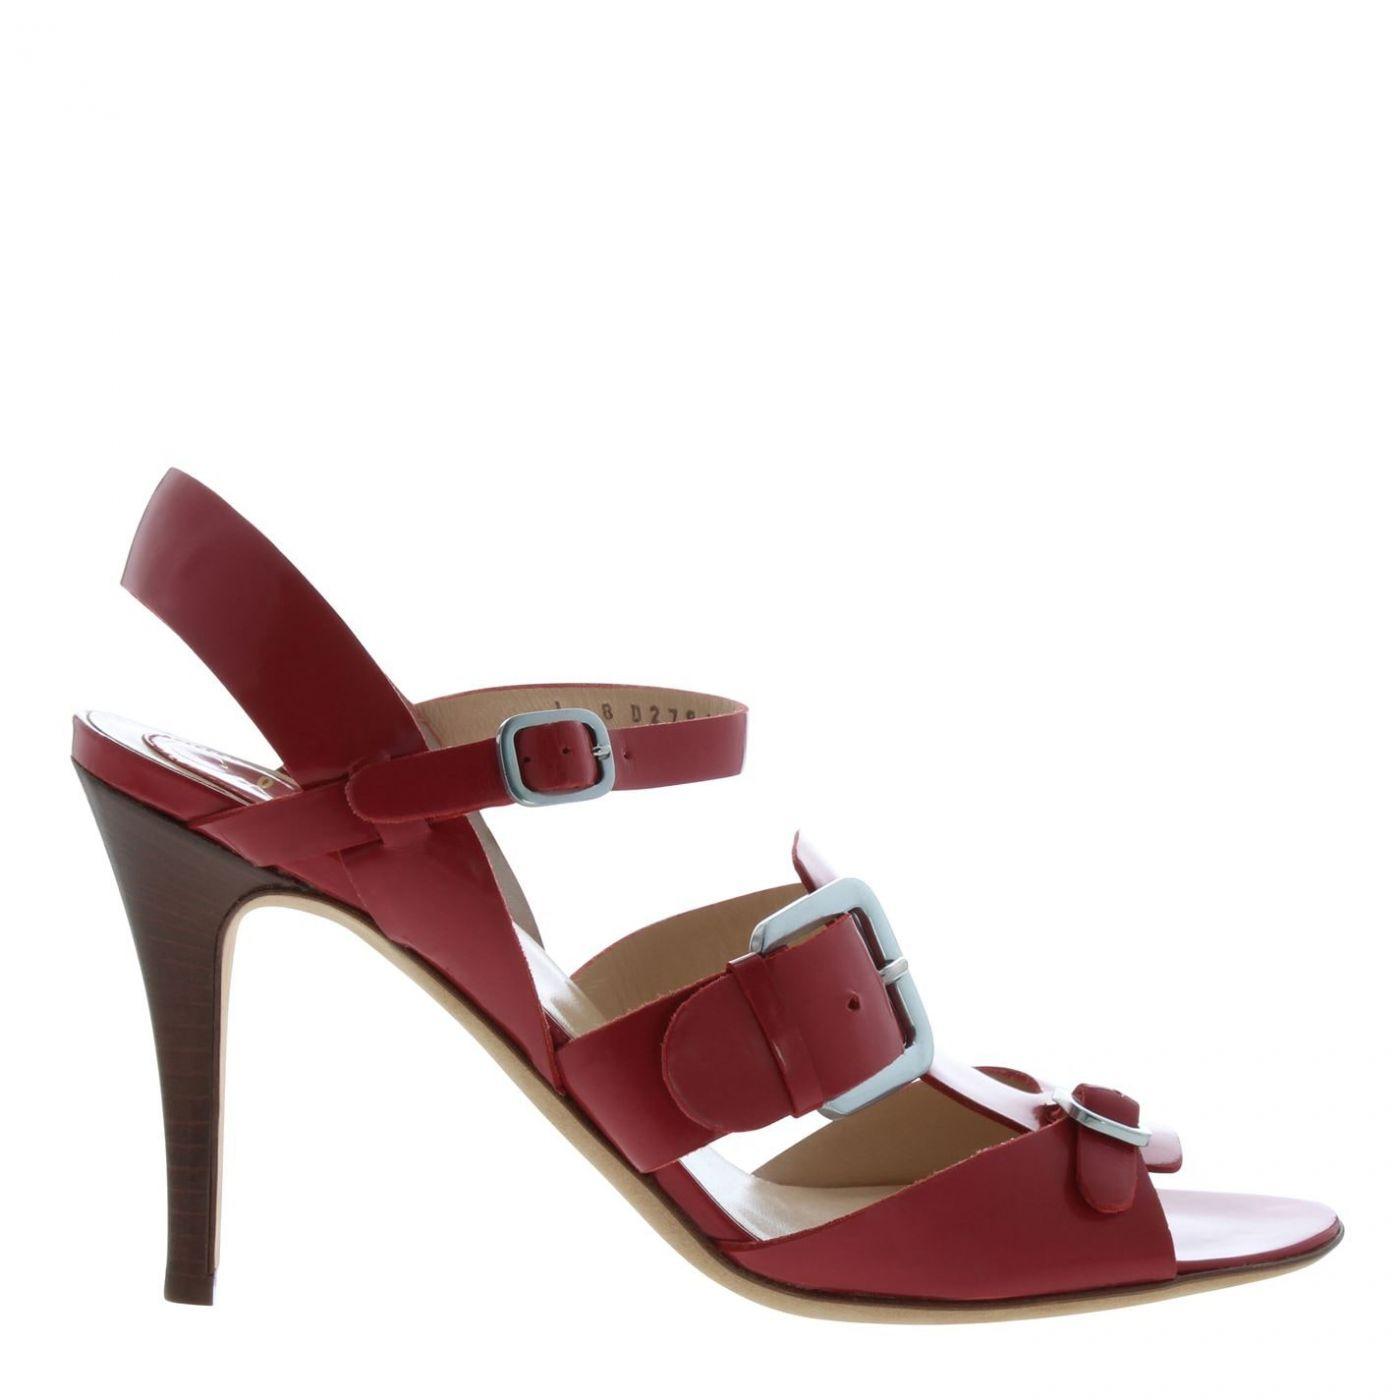 Cole Haan Strap Sandals Ladies